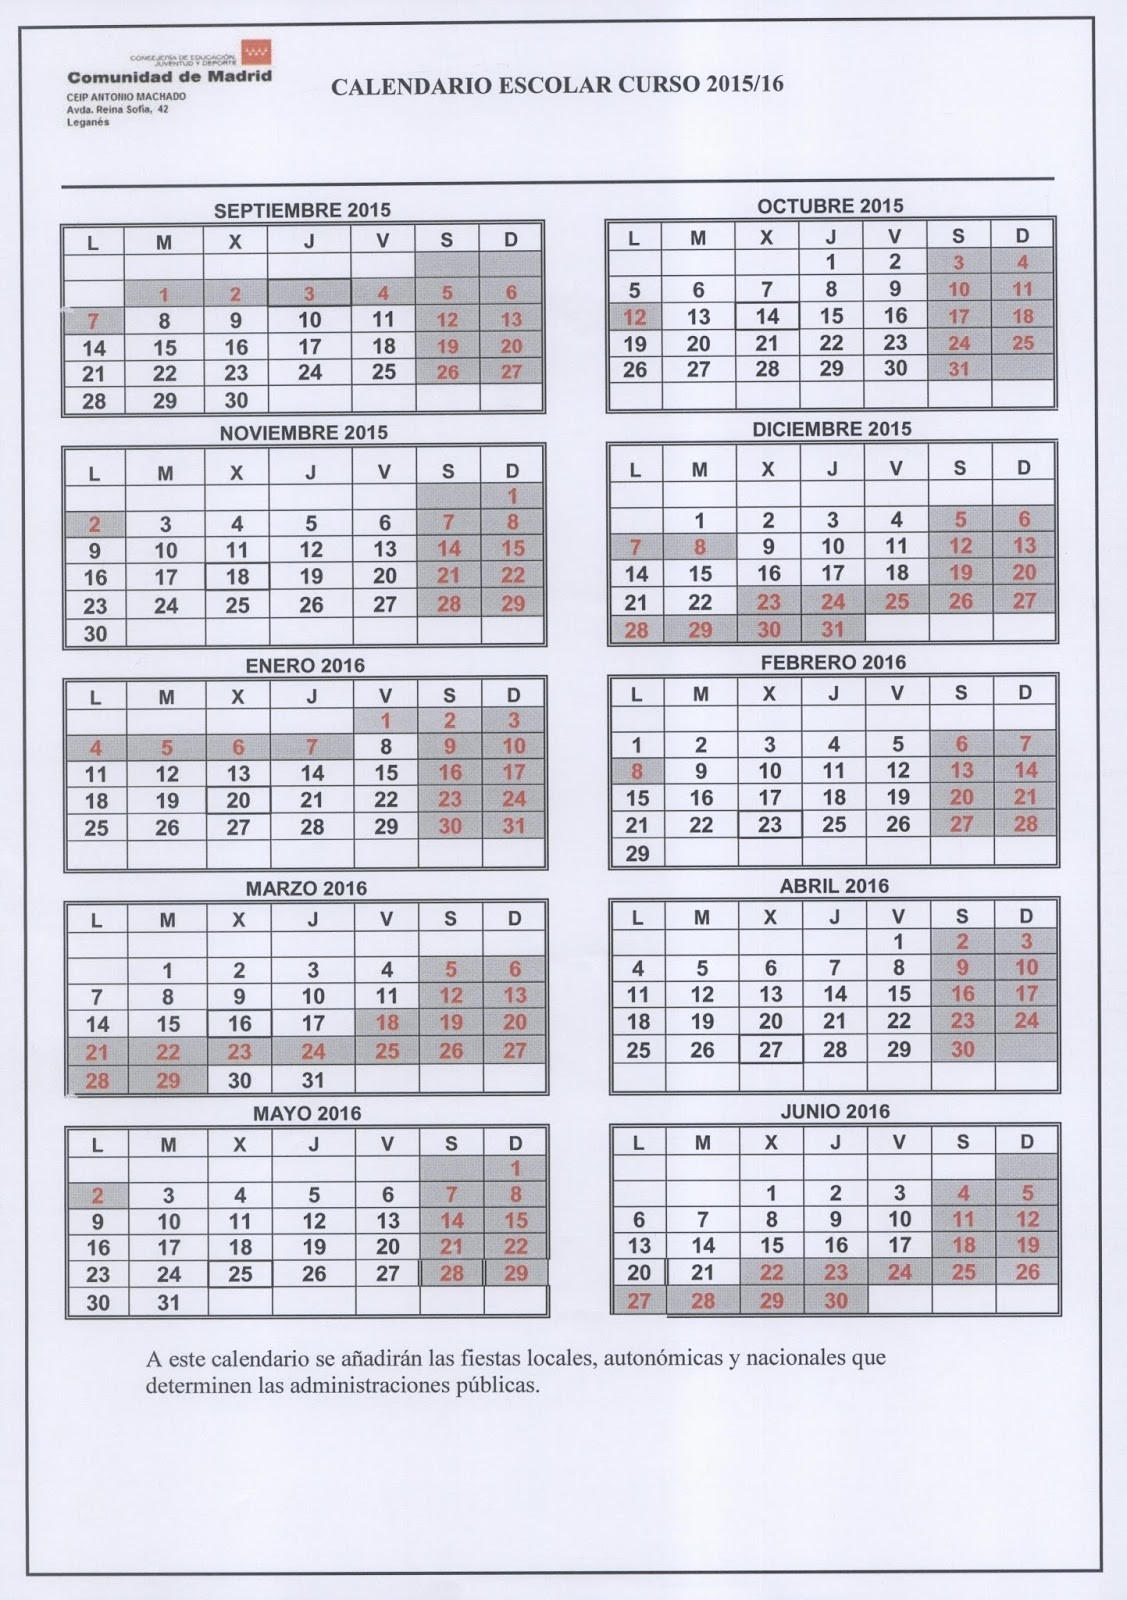 Depo Provera Calendar - Cprc  Depo Calendar Online